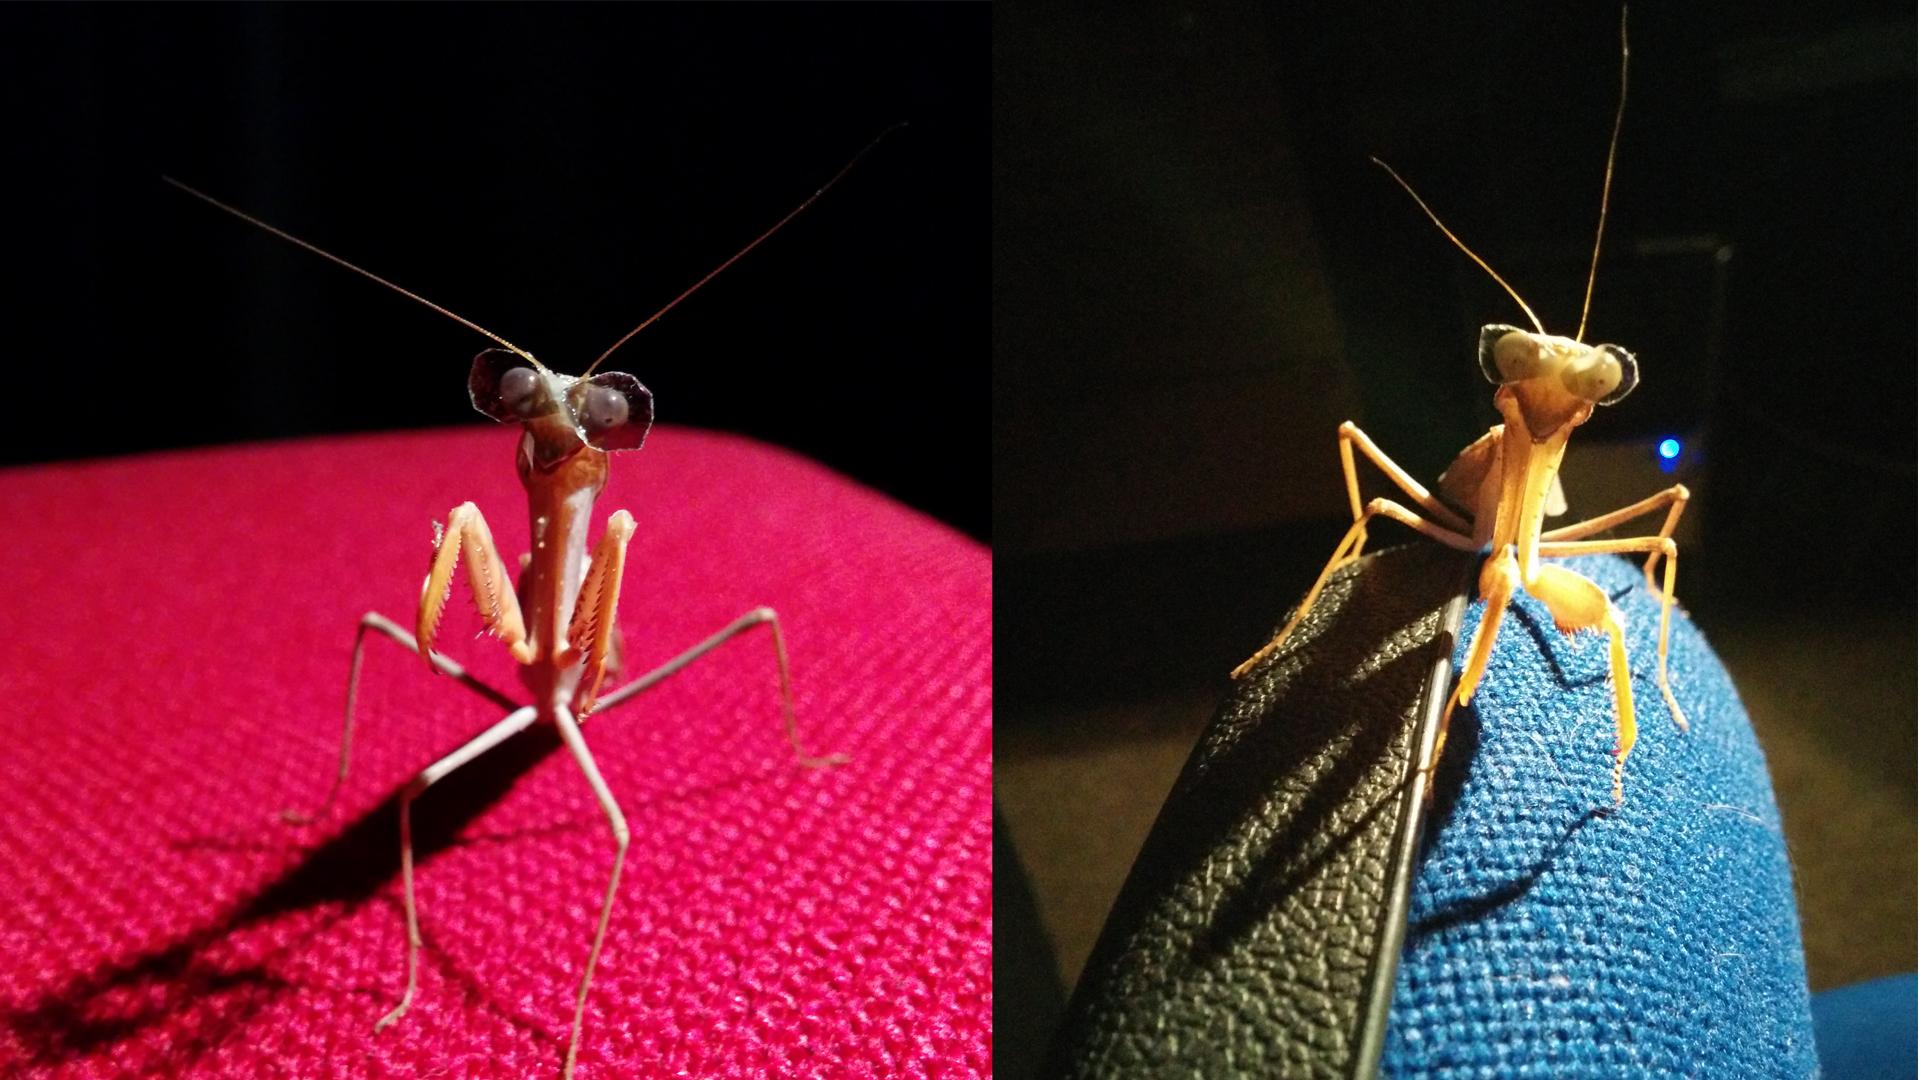 It's strange, but true — this is a praying mantis wearing 3-D ...